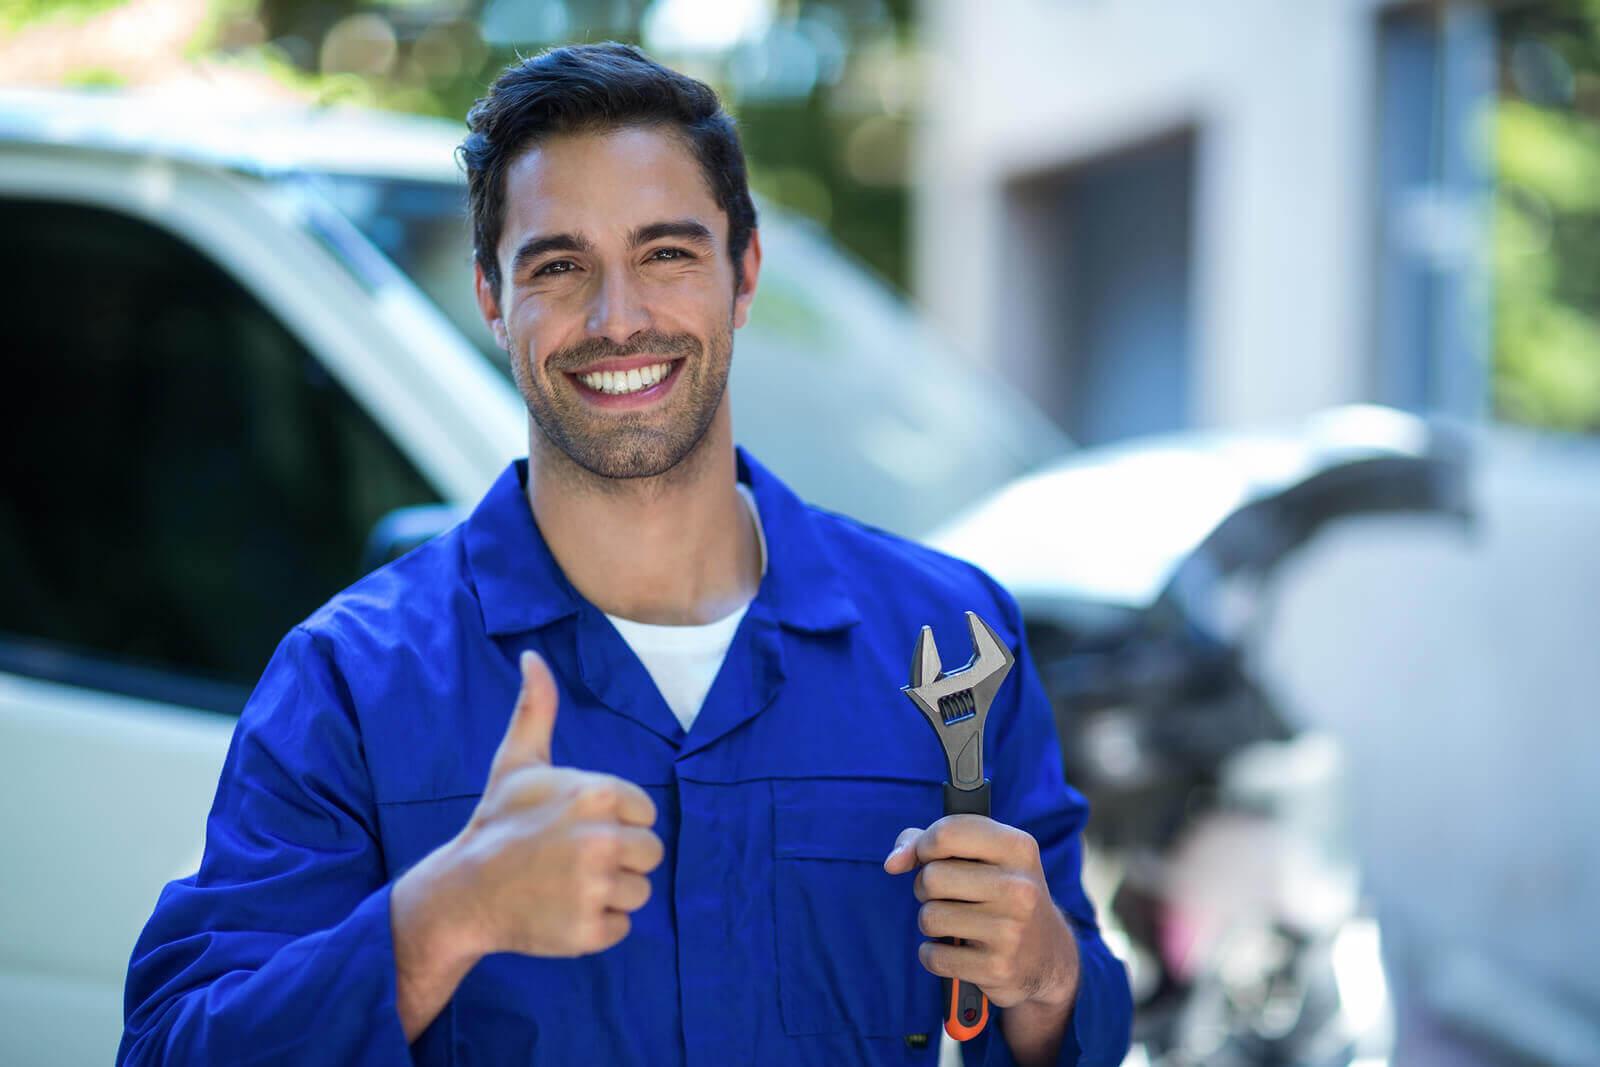 A Happy Mechanic